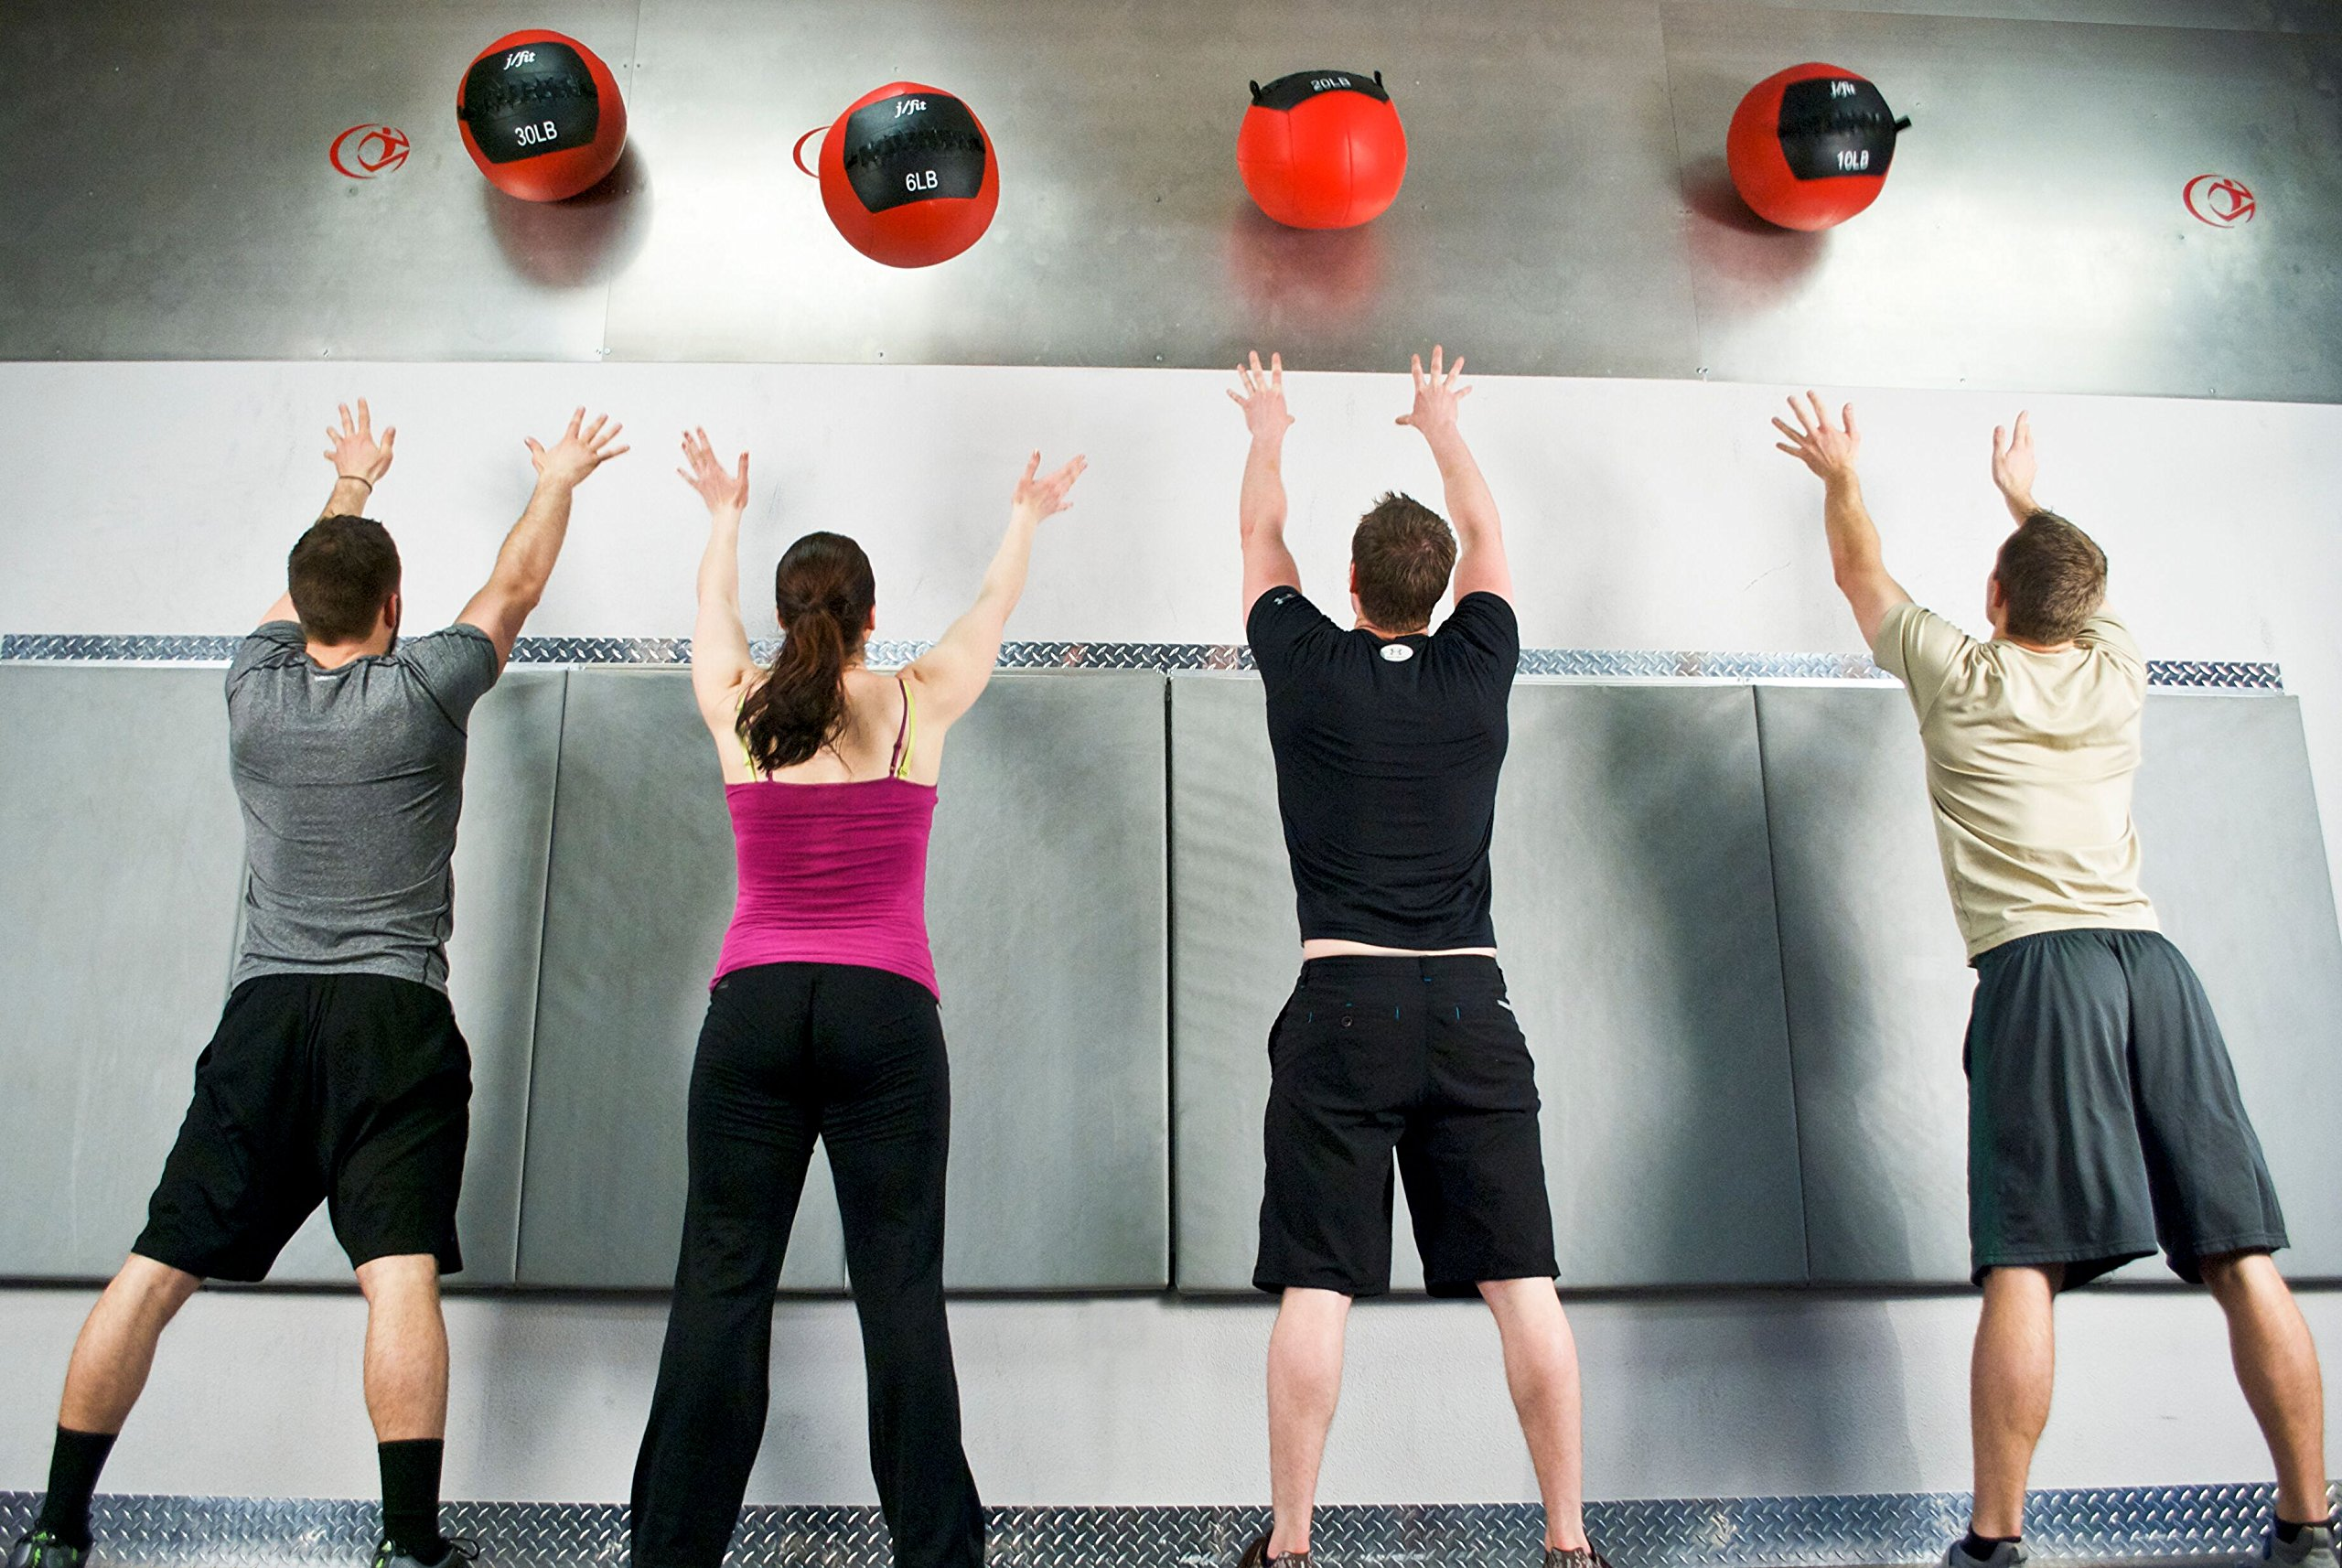 j/fit Medicine Ball, Red/Black, 18-Pound